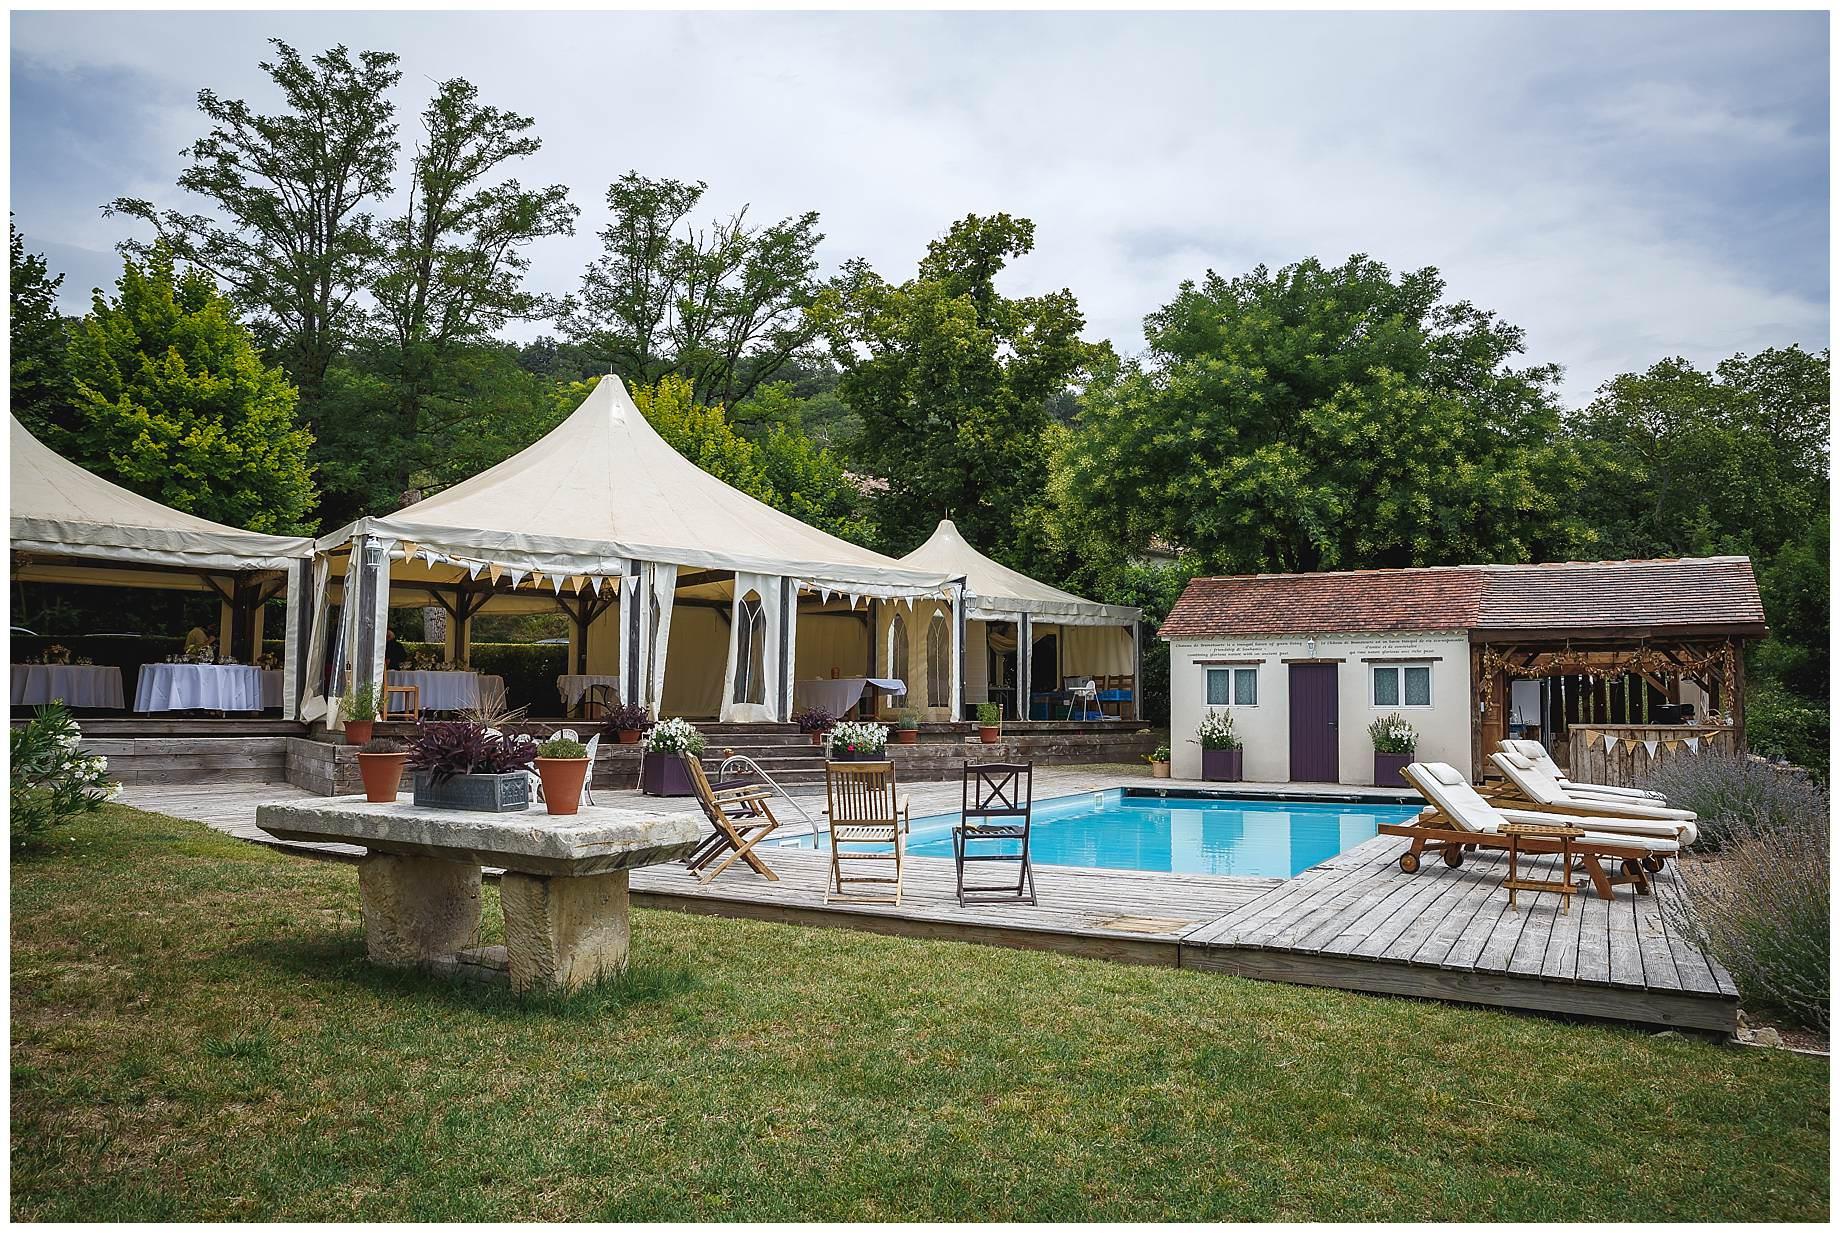 The swimming pool at Chateau Brametourte